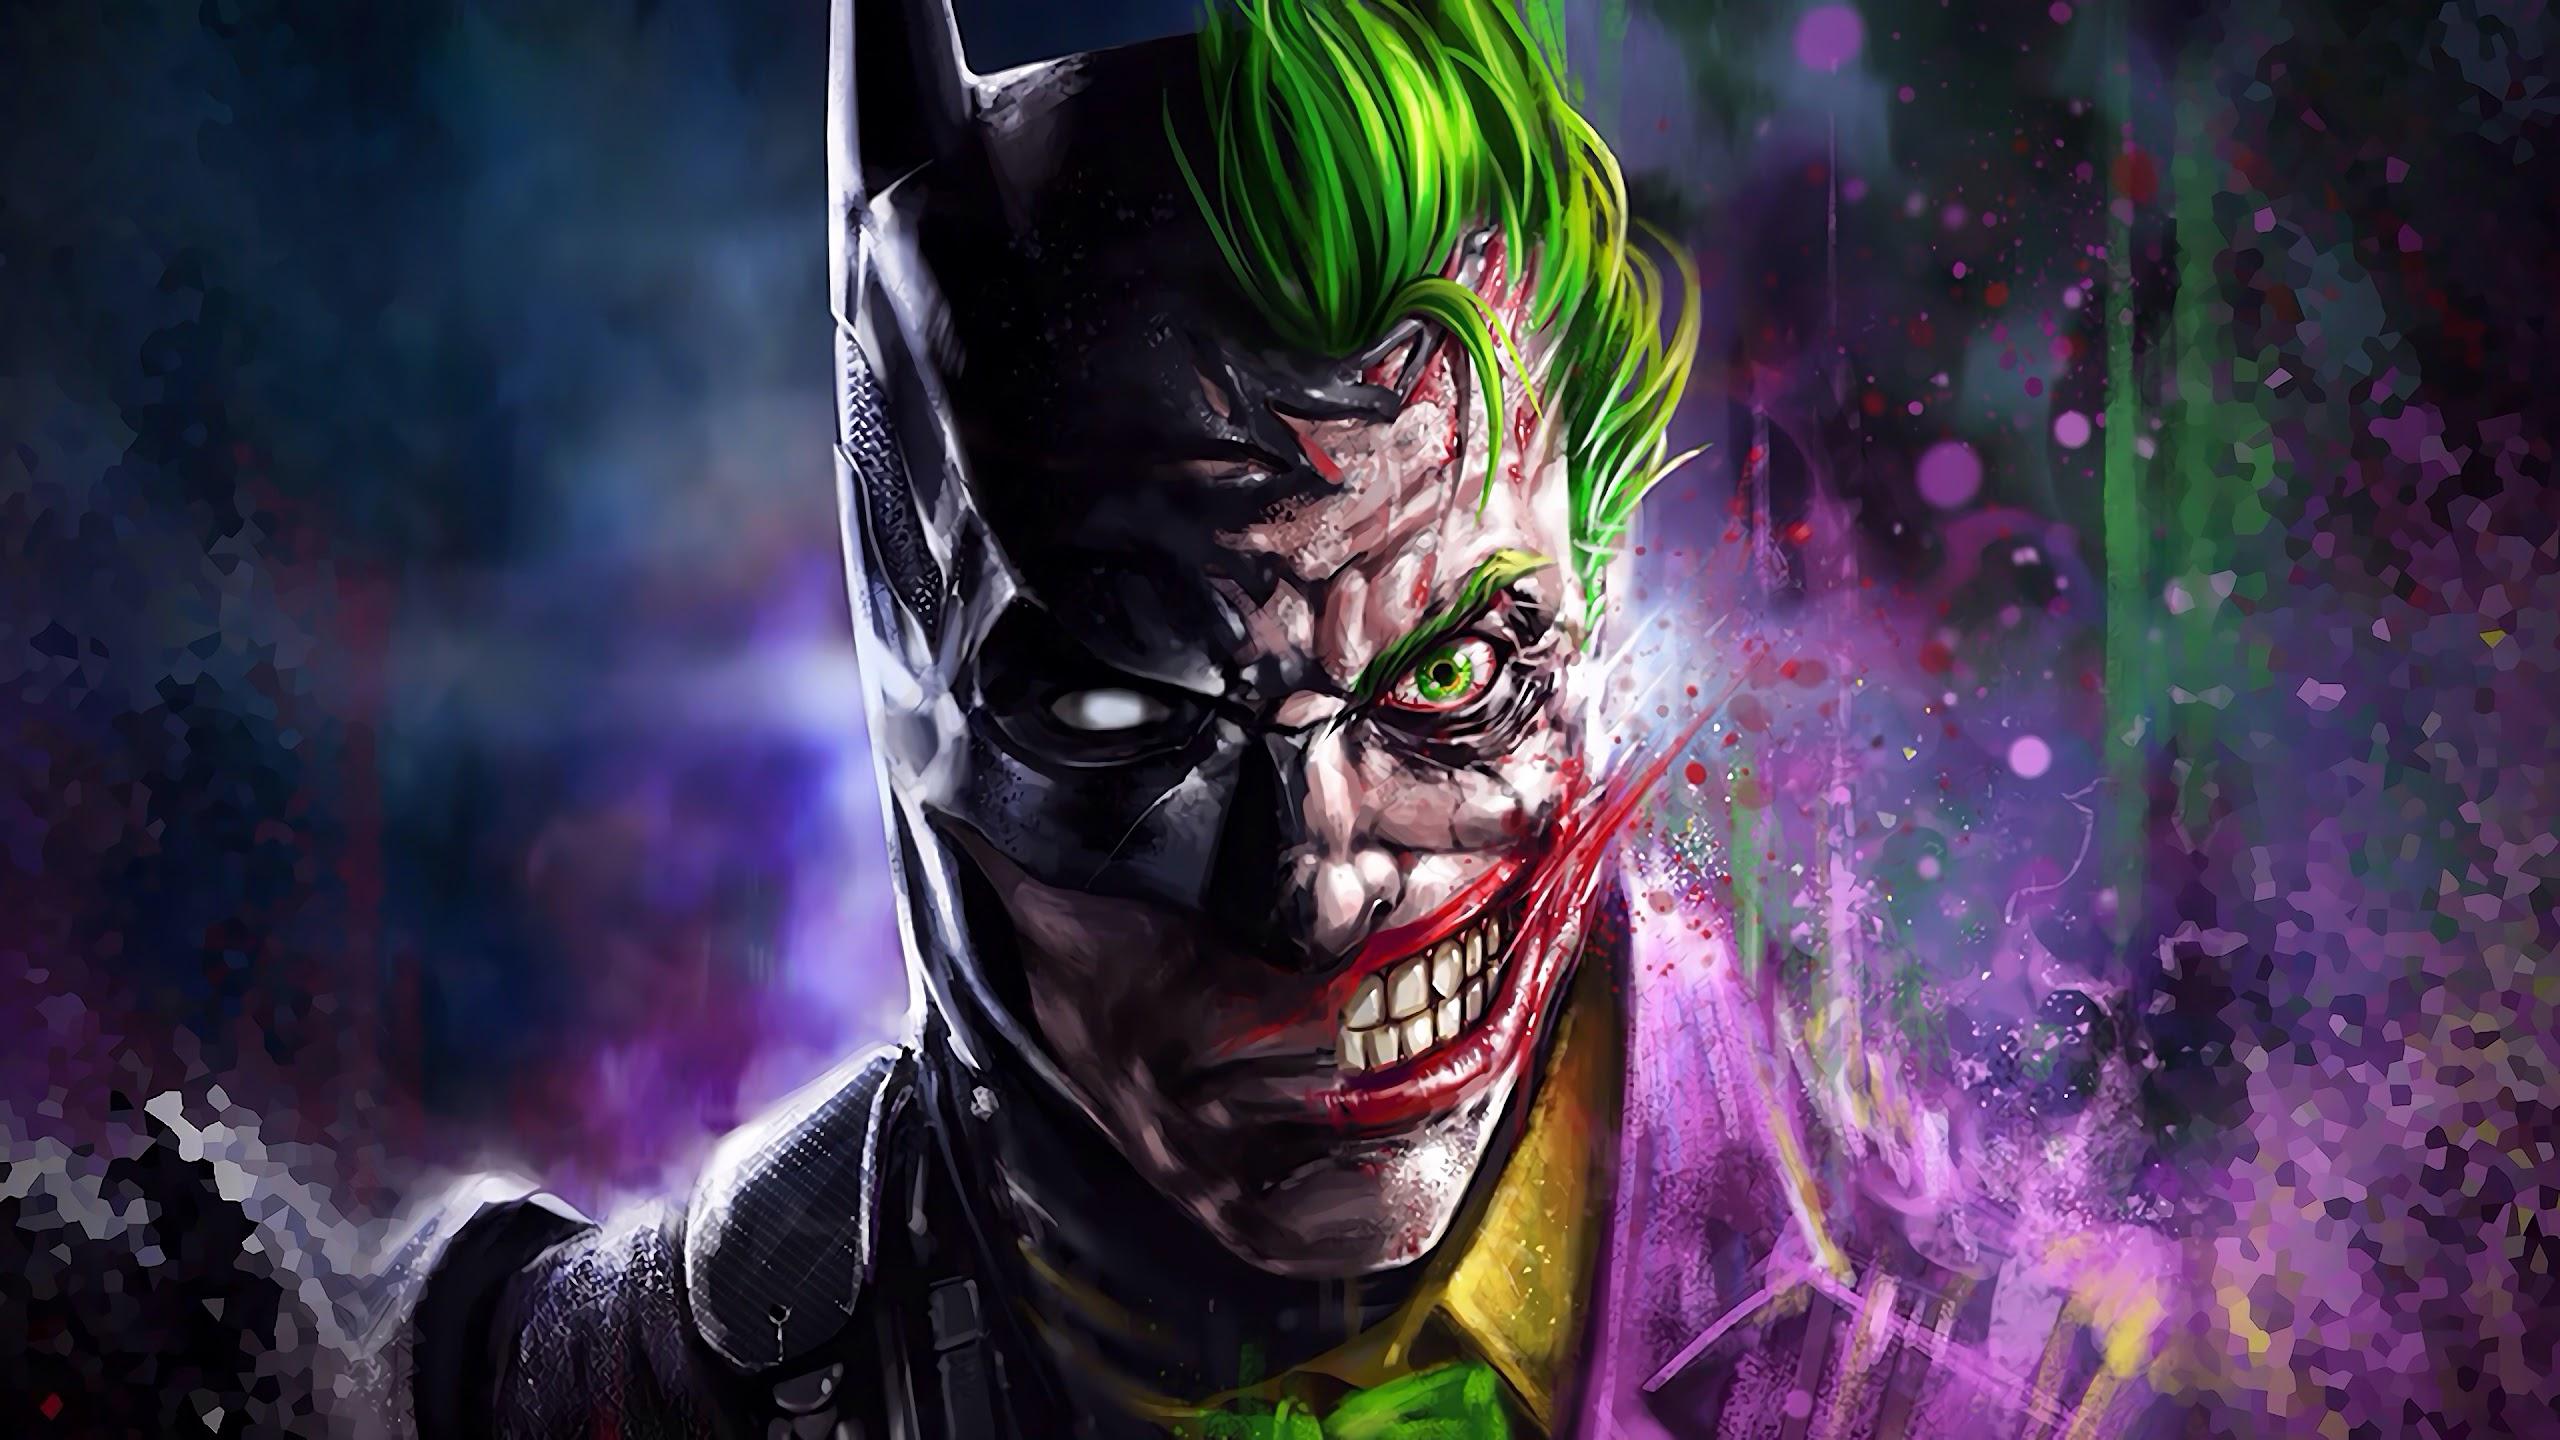 batman joker uhdpaper.com 4K 221